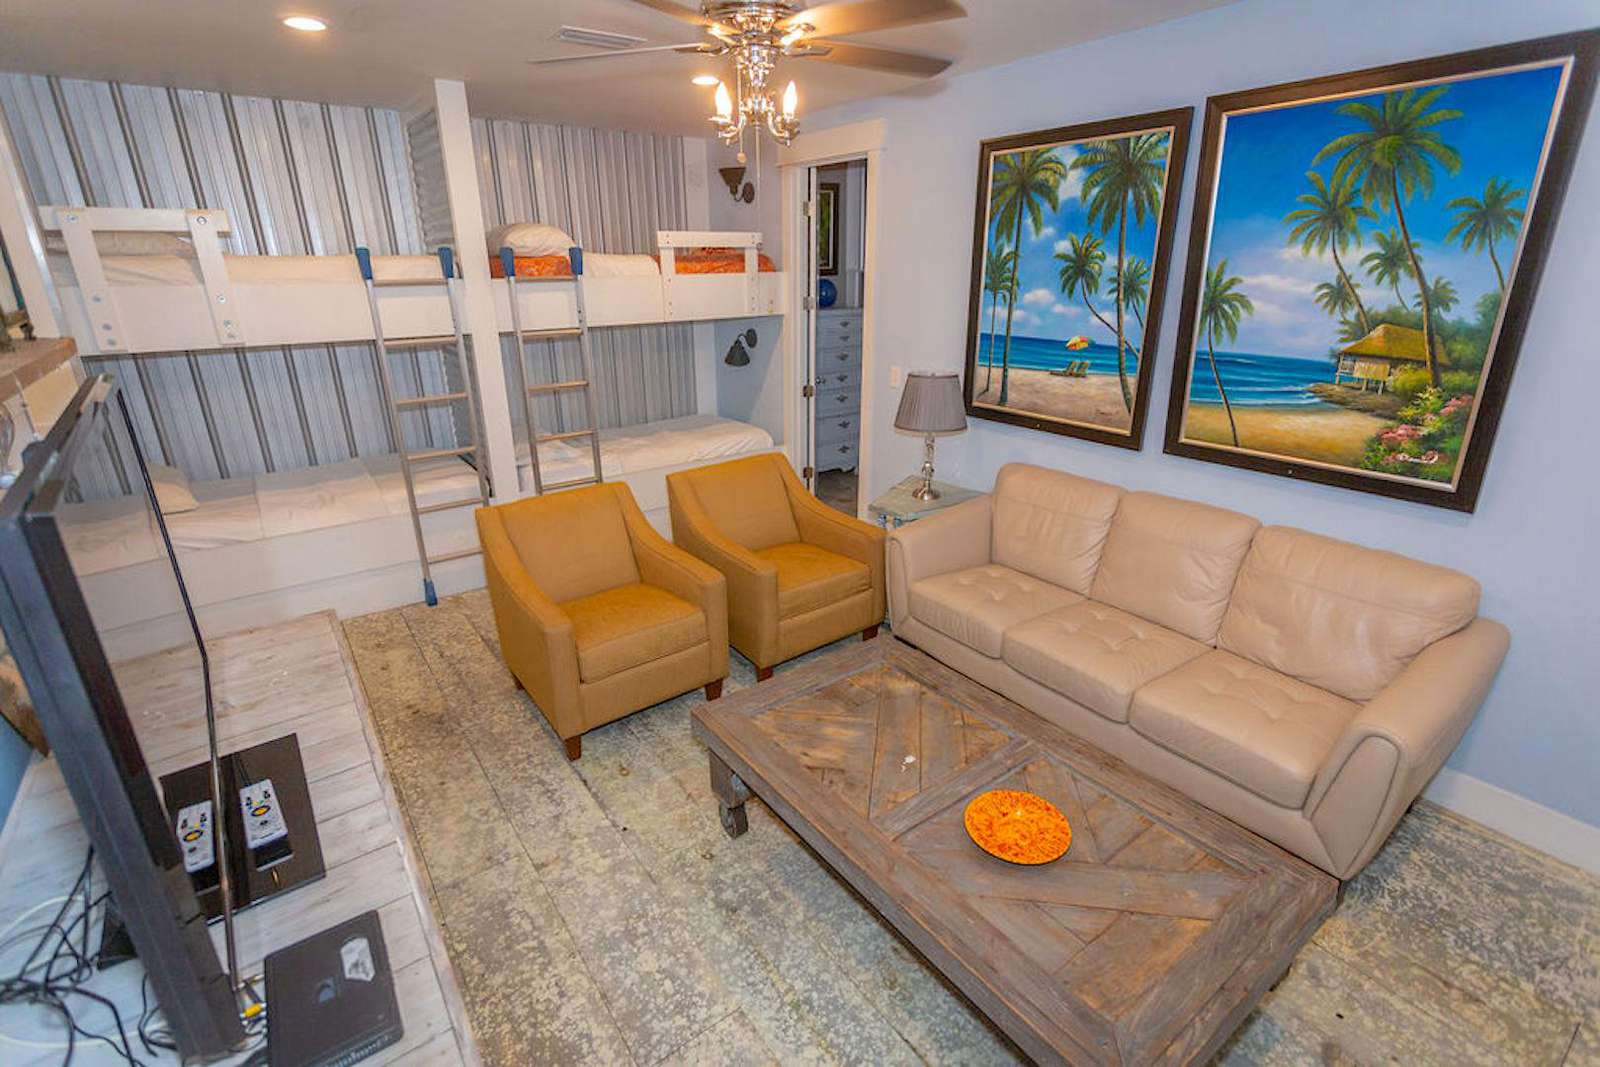 family room, sofa, 2 chairs, 3 sets of bunks-sleeps 6, flat screen